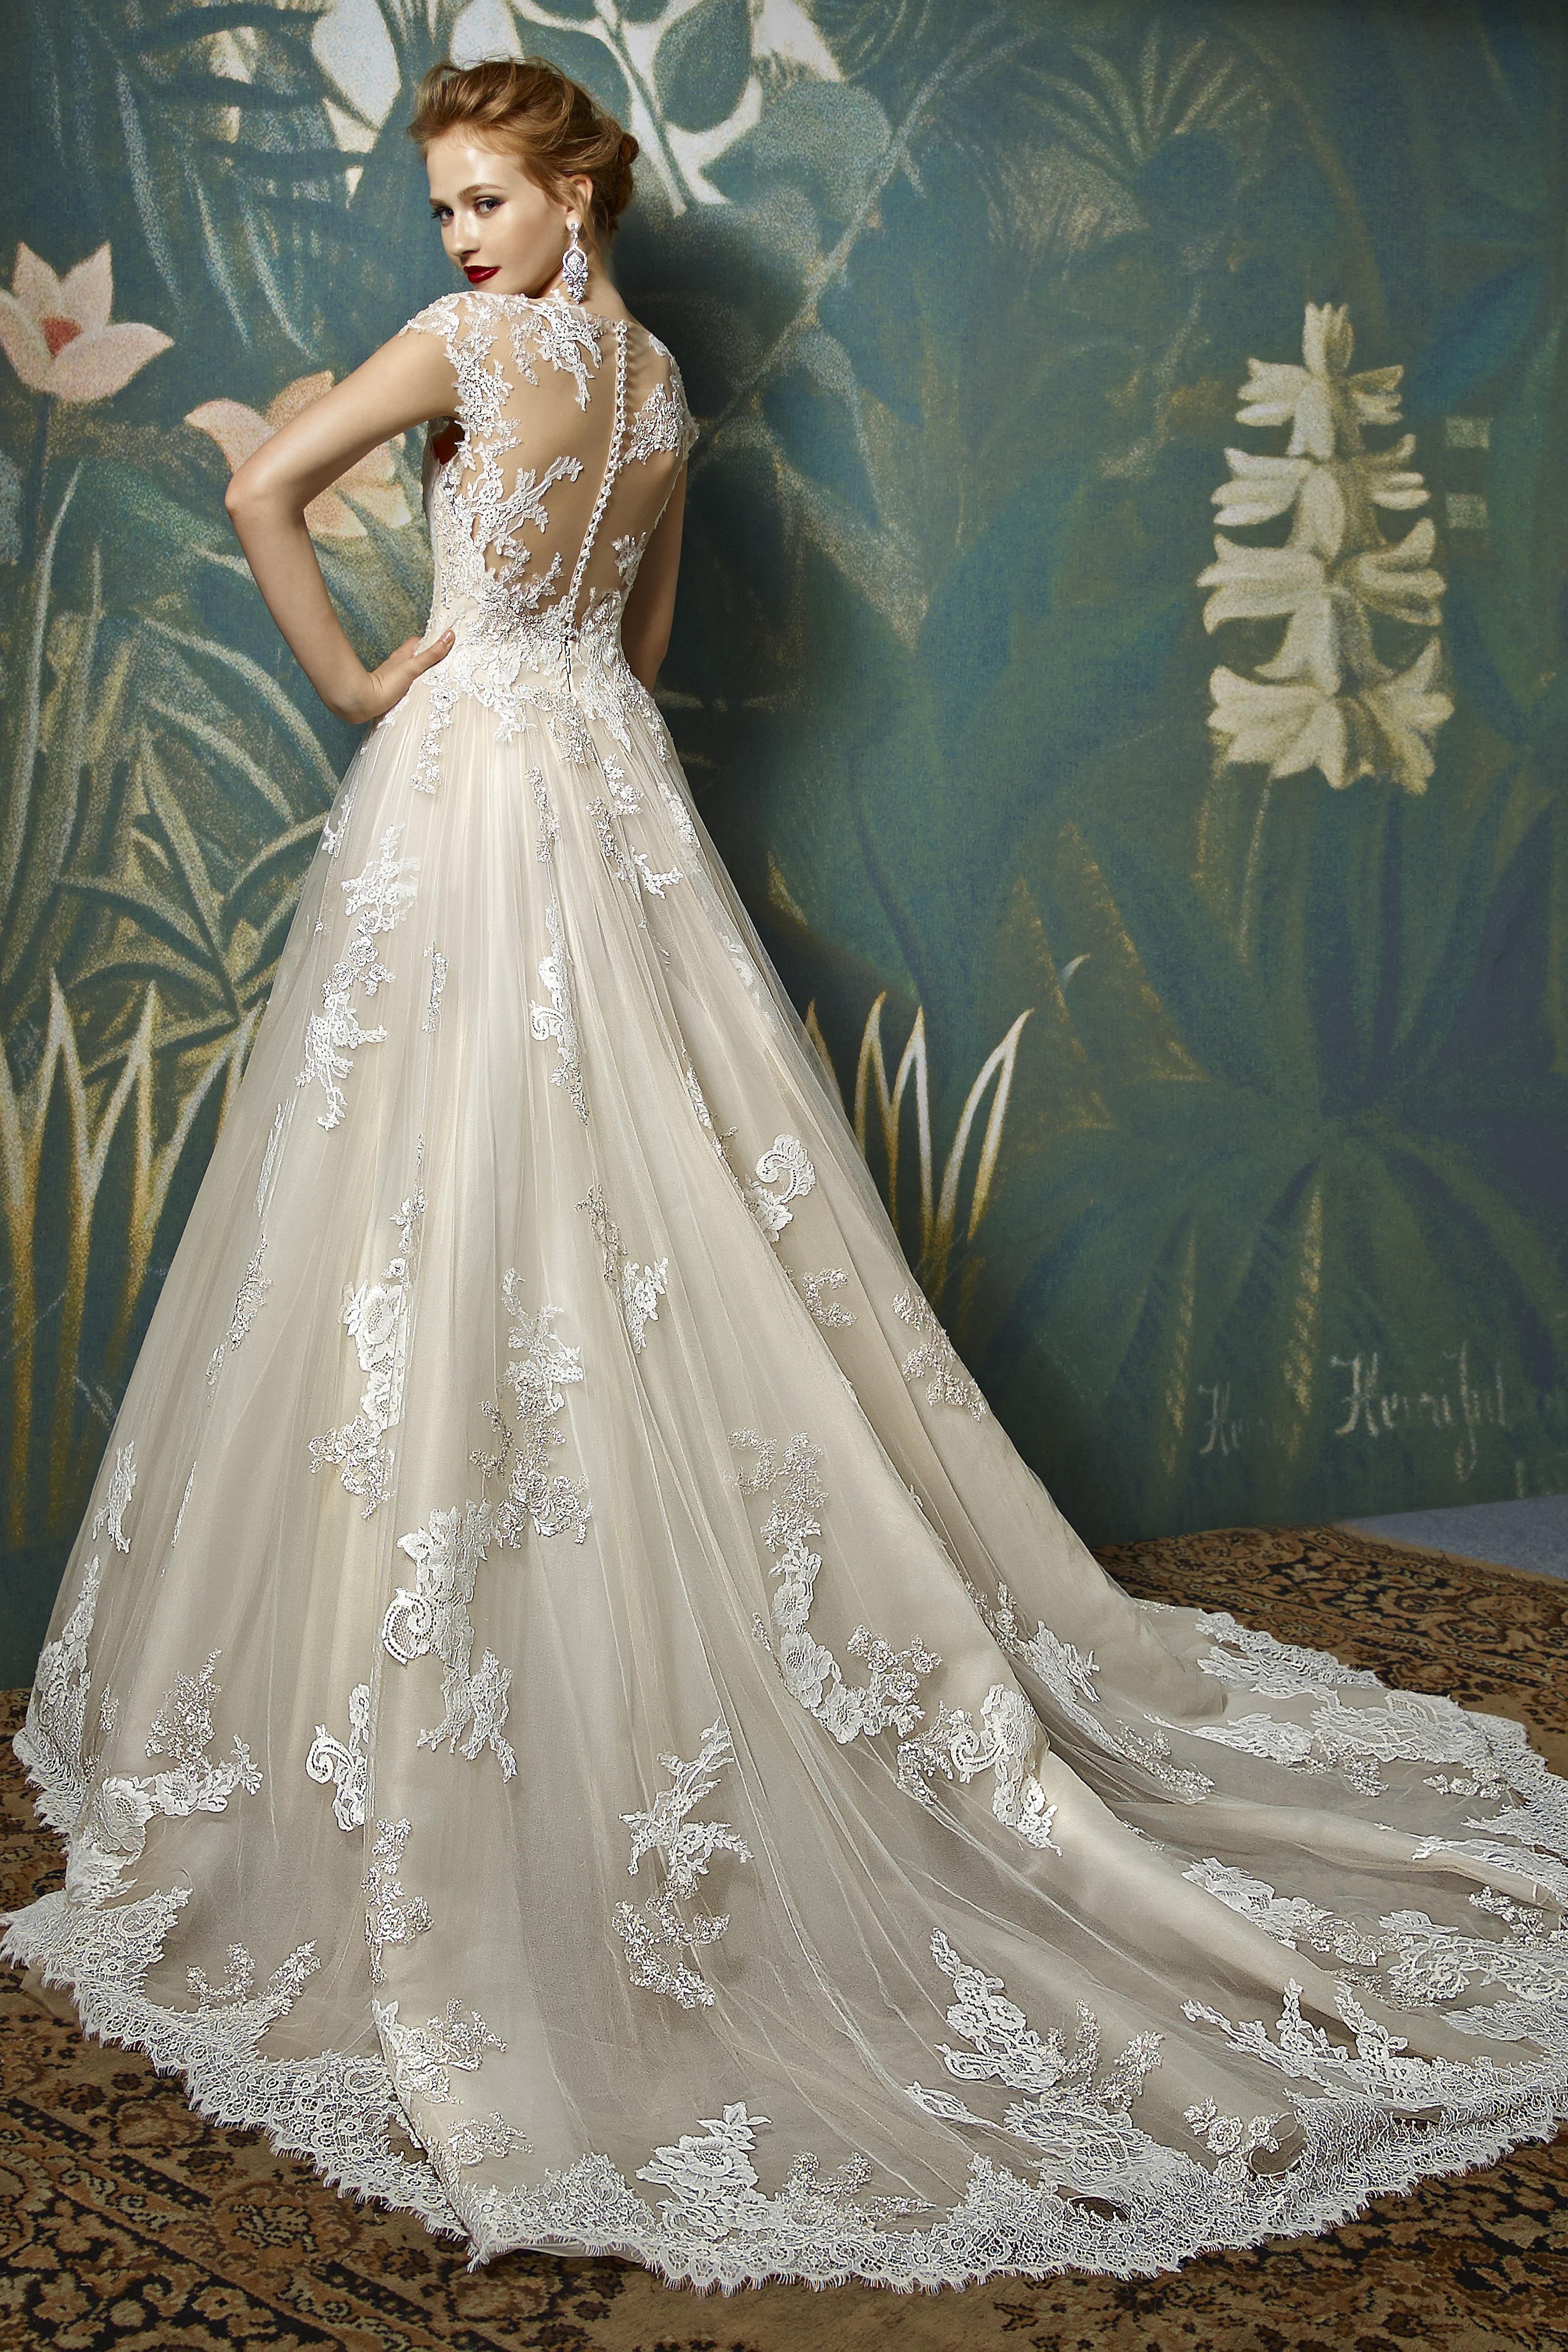 Pin by kiah holley on wedding pinterest wedding dress blue